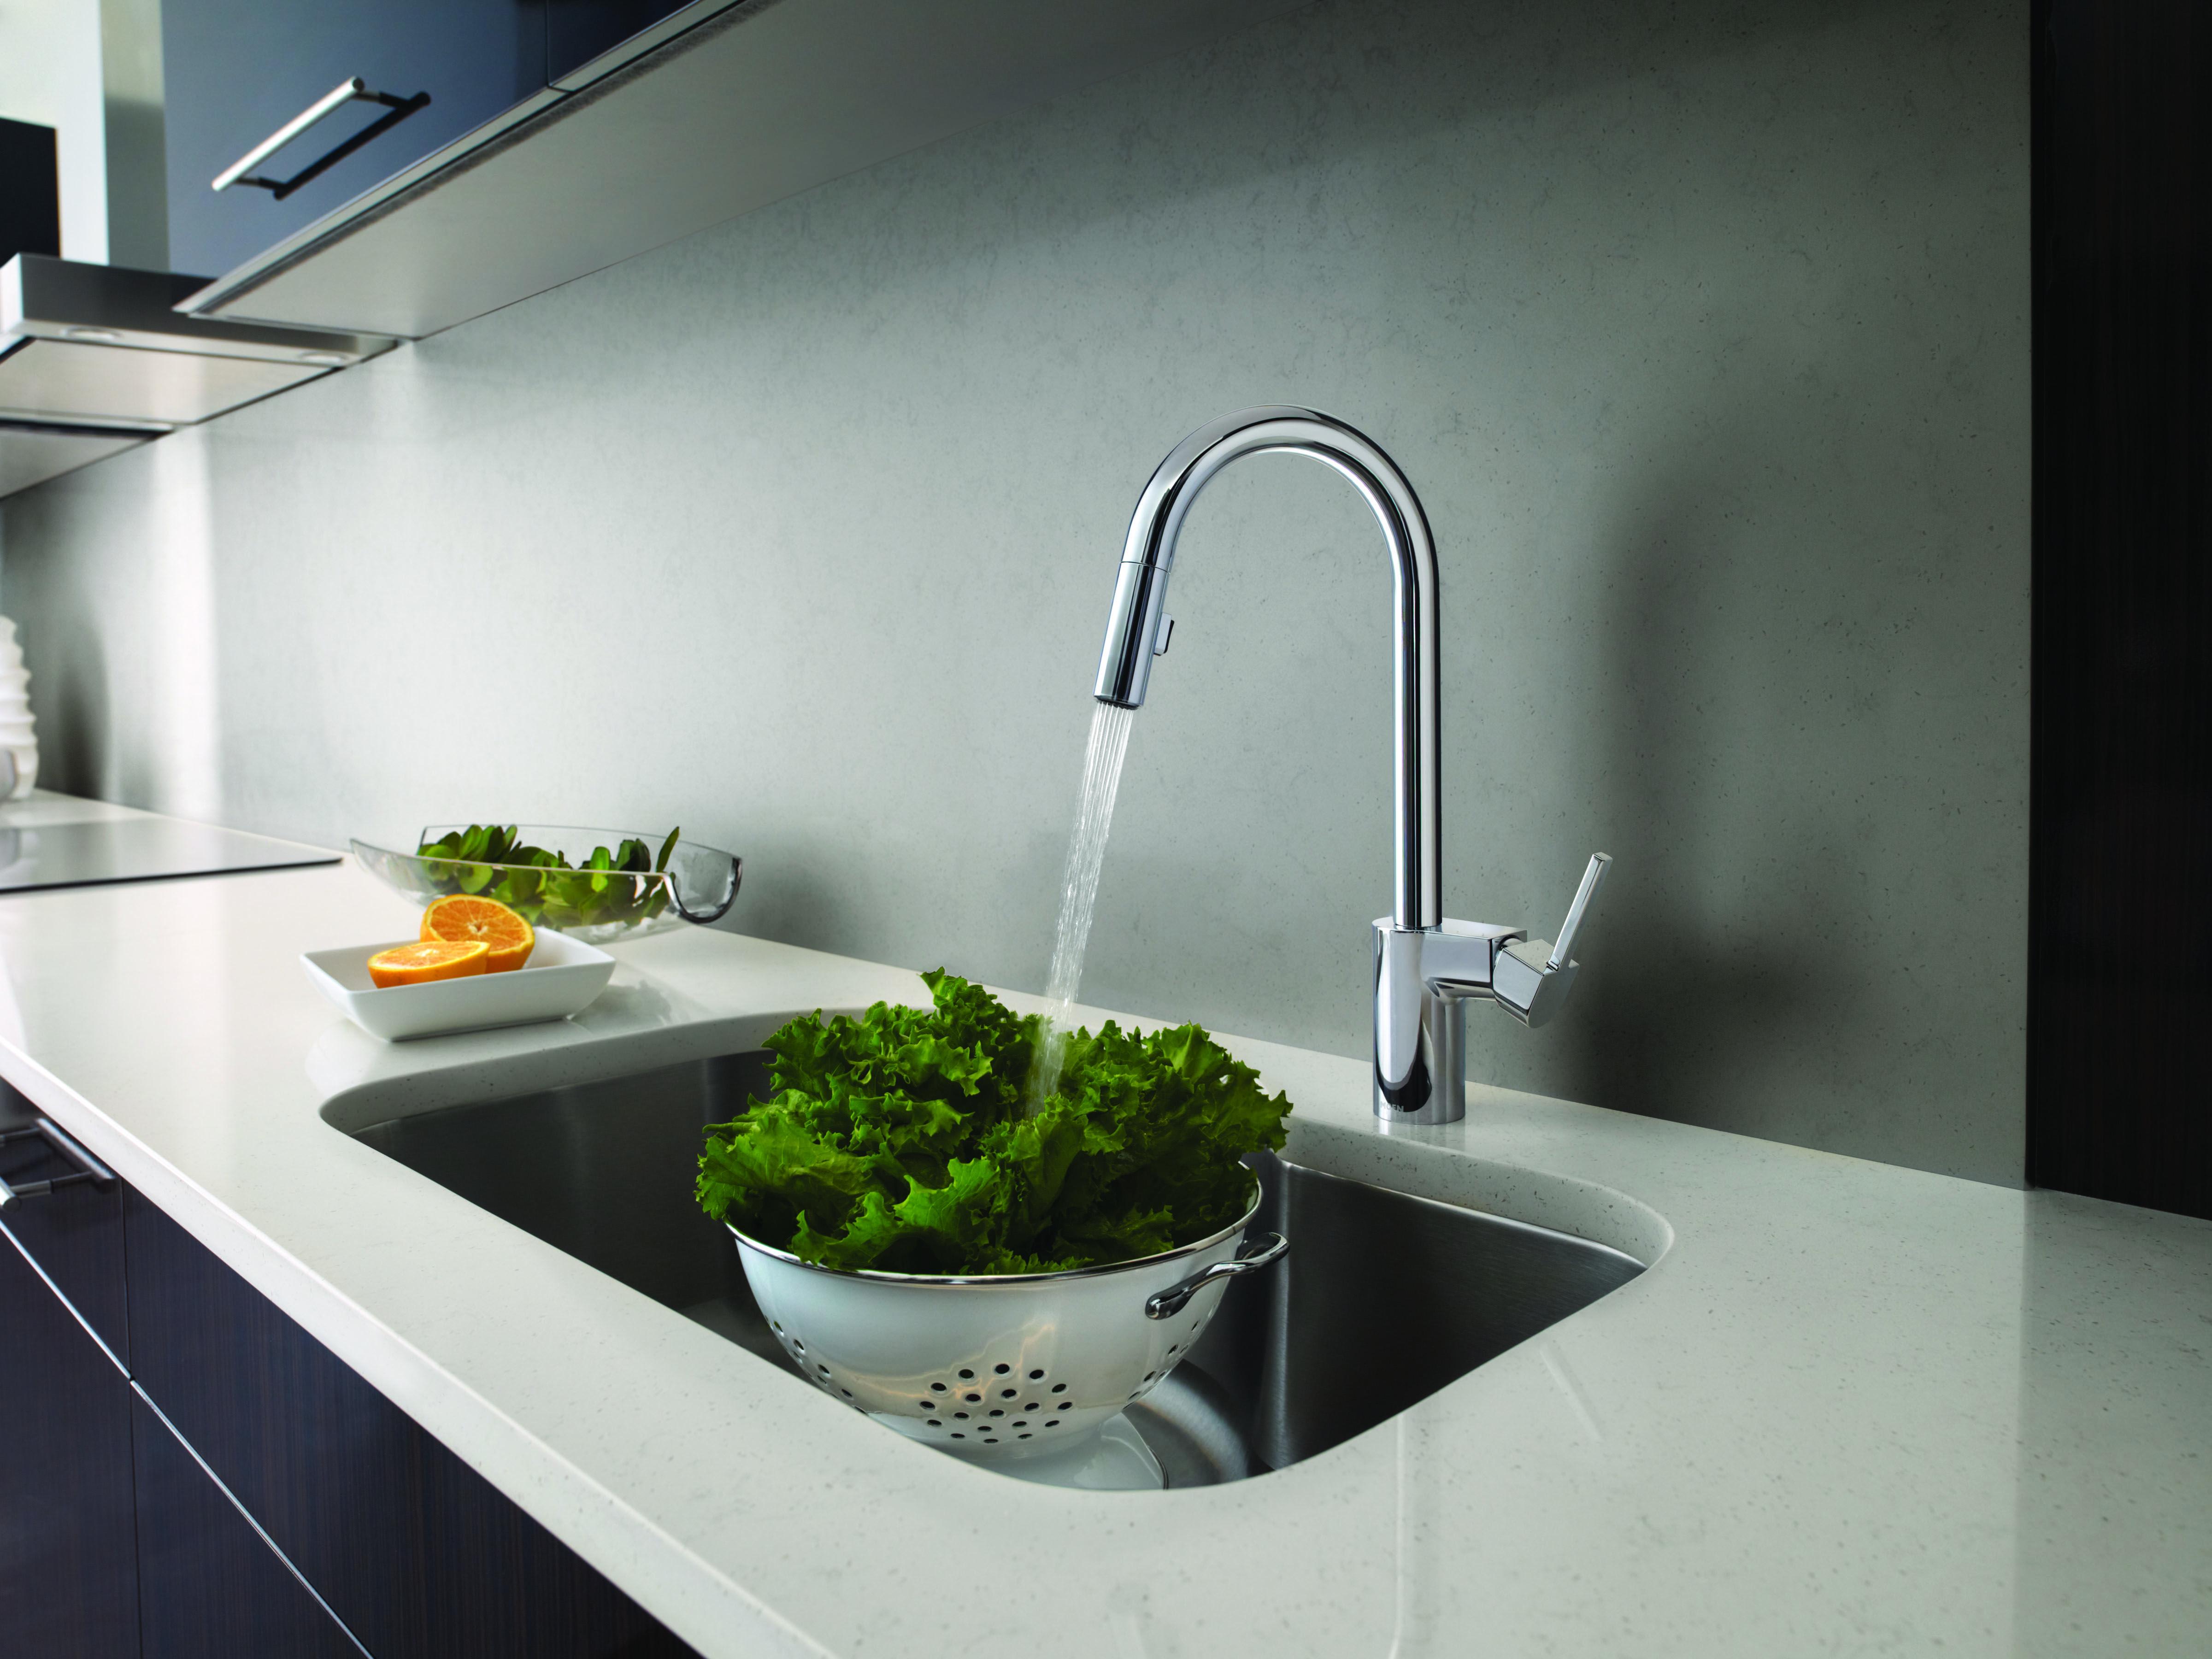 17 Best Images About Ultra Modern Kitchen Faucet Designs Ideas